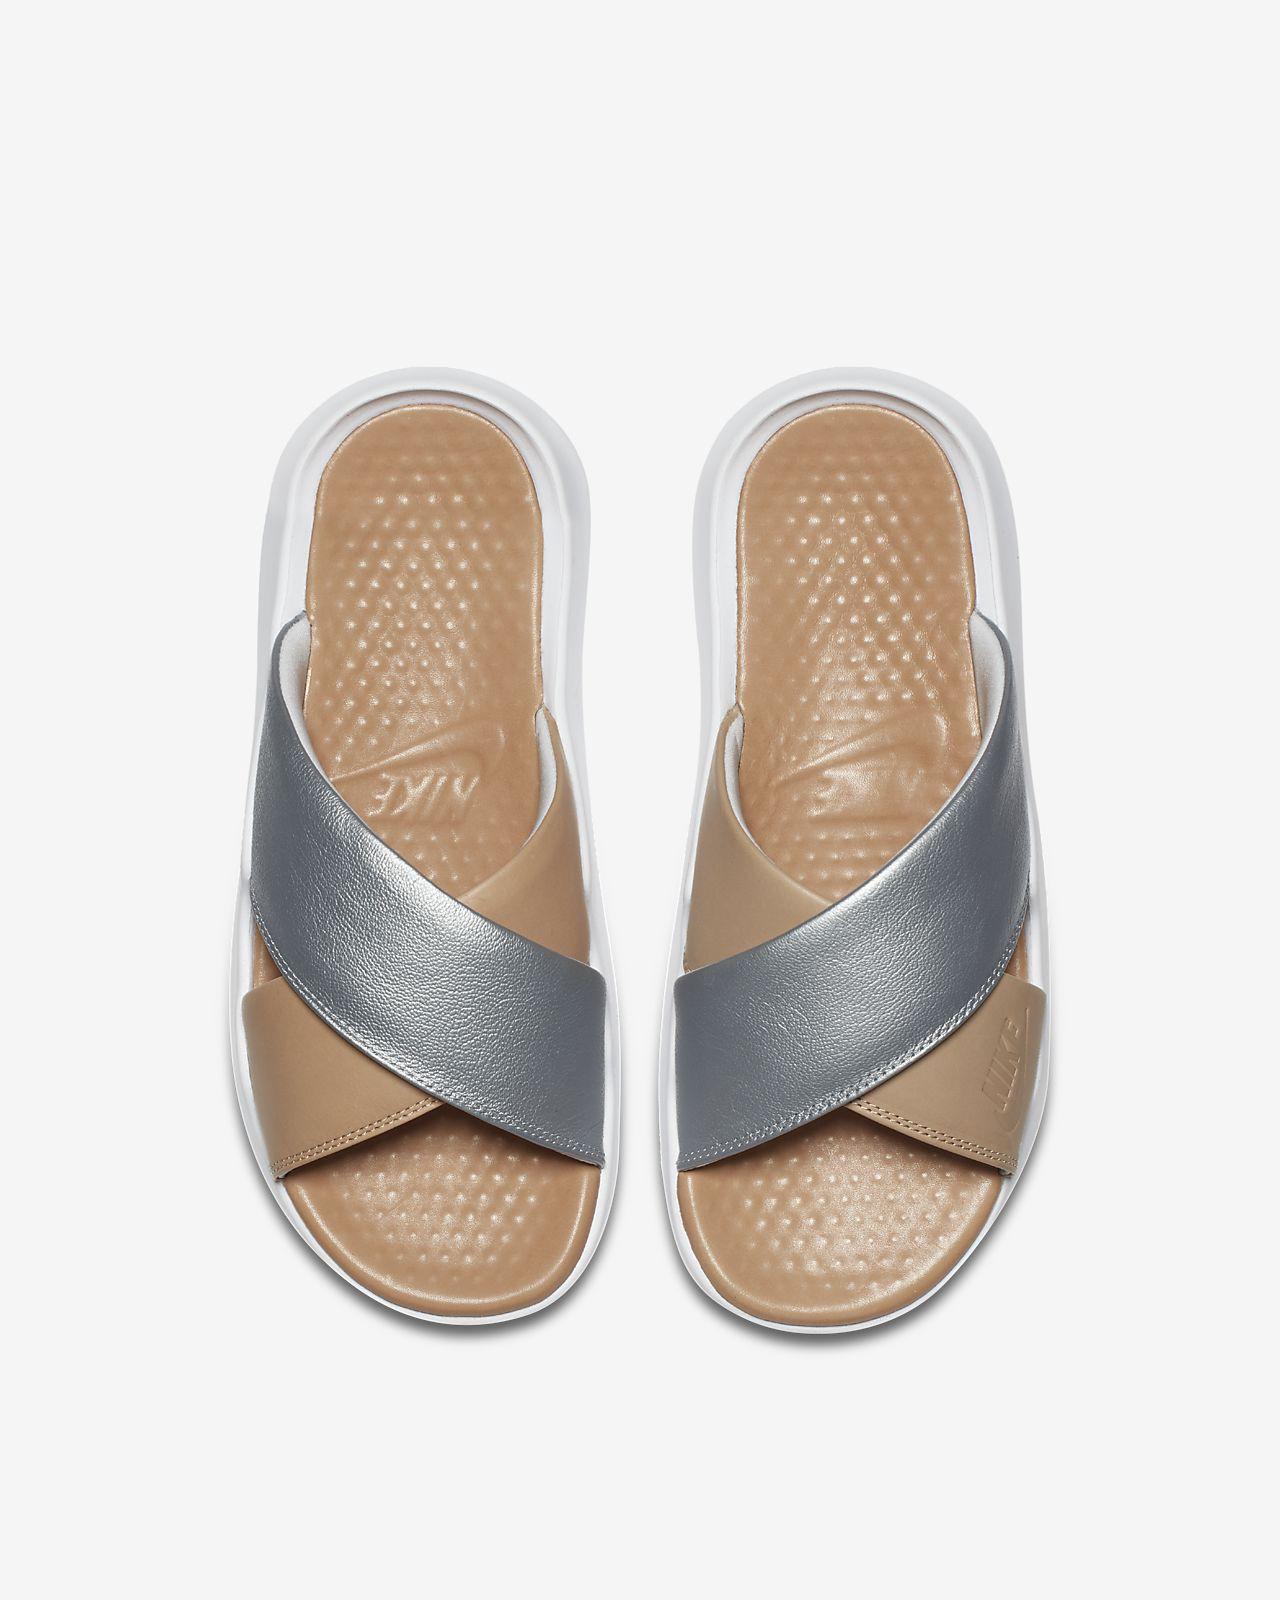 2949d2eb6 Nike Benassi Future Cross Se Premium Women s Slide - 10 Beige ...